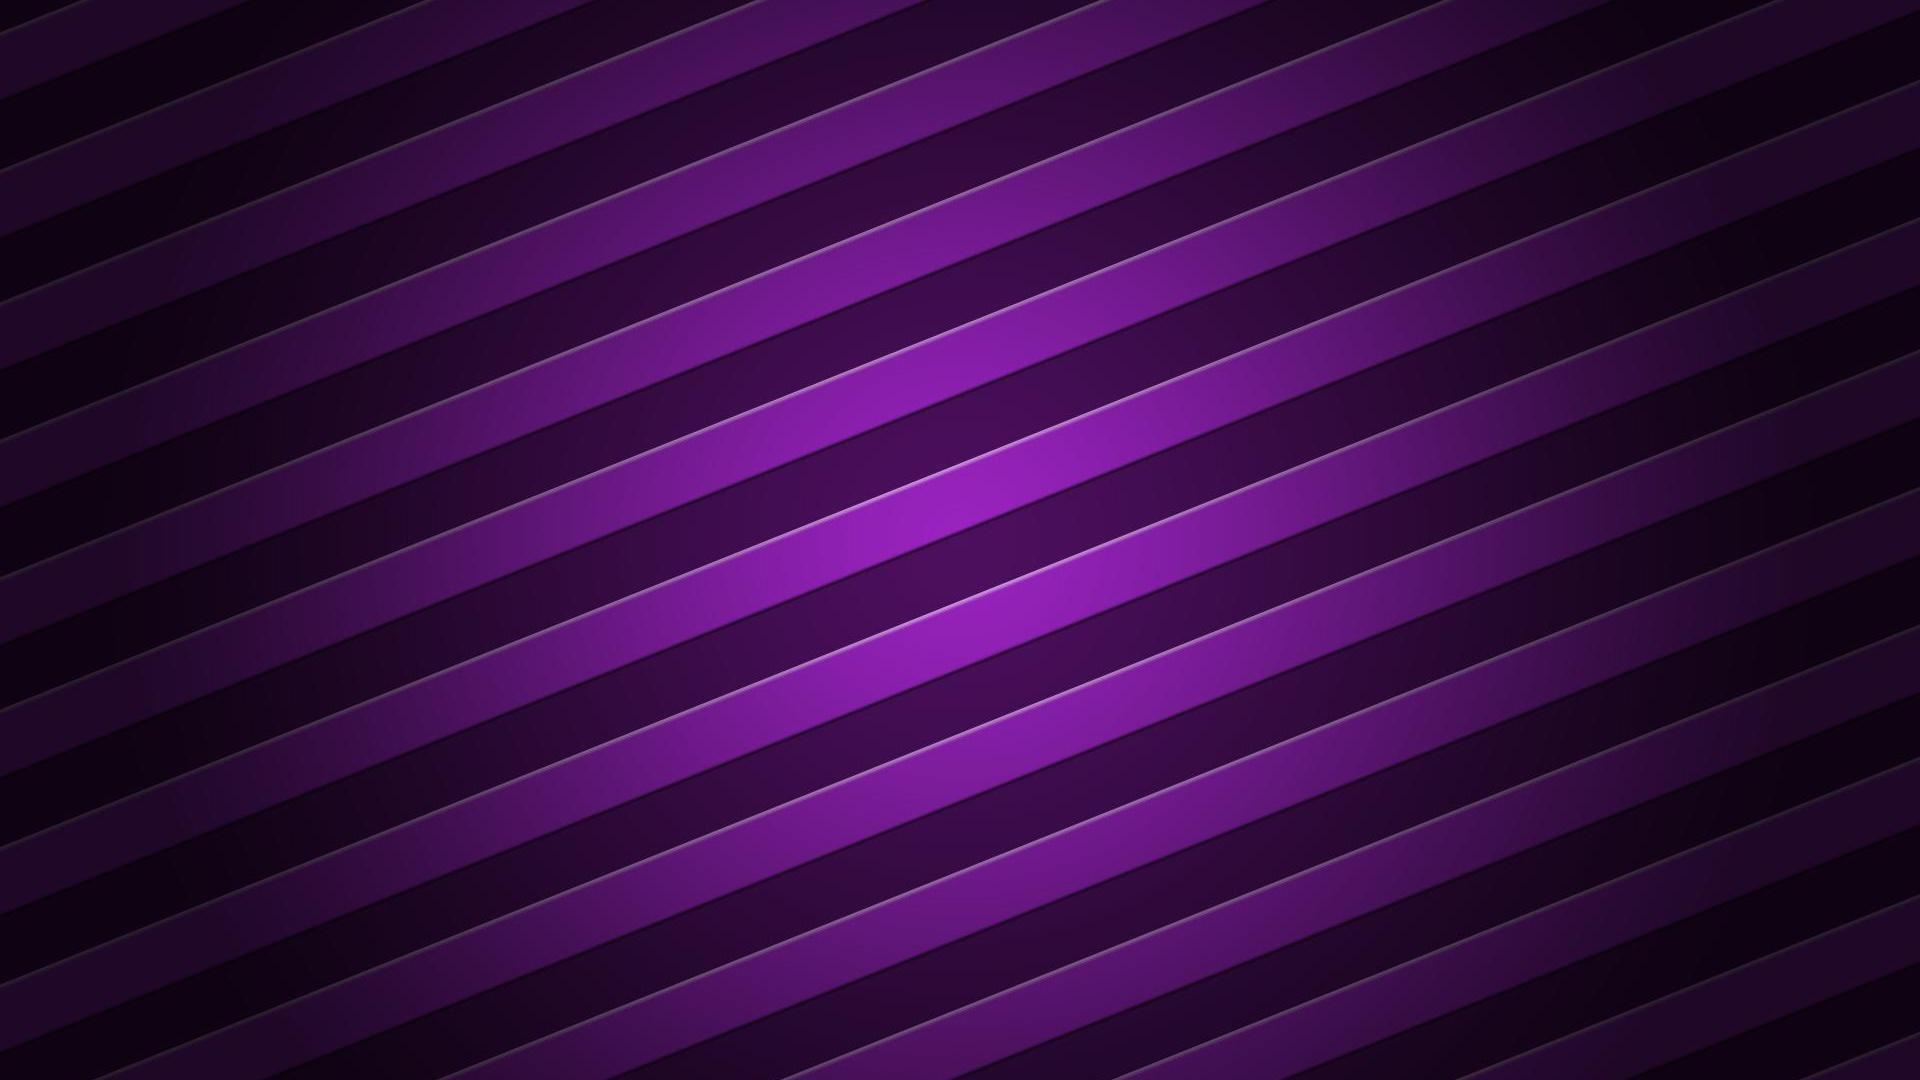 backgrounds wallpaper desktop striped stripe purple images 1920x1080